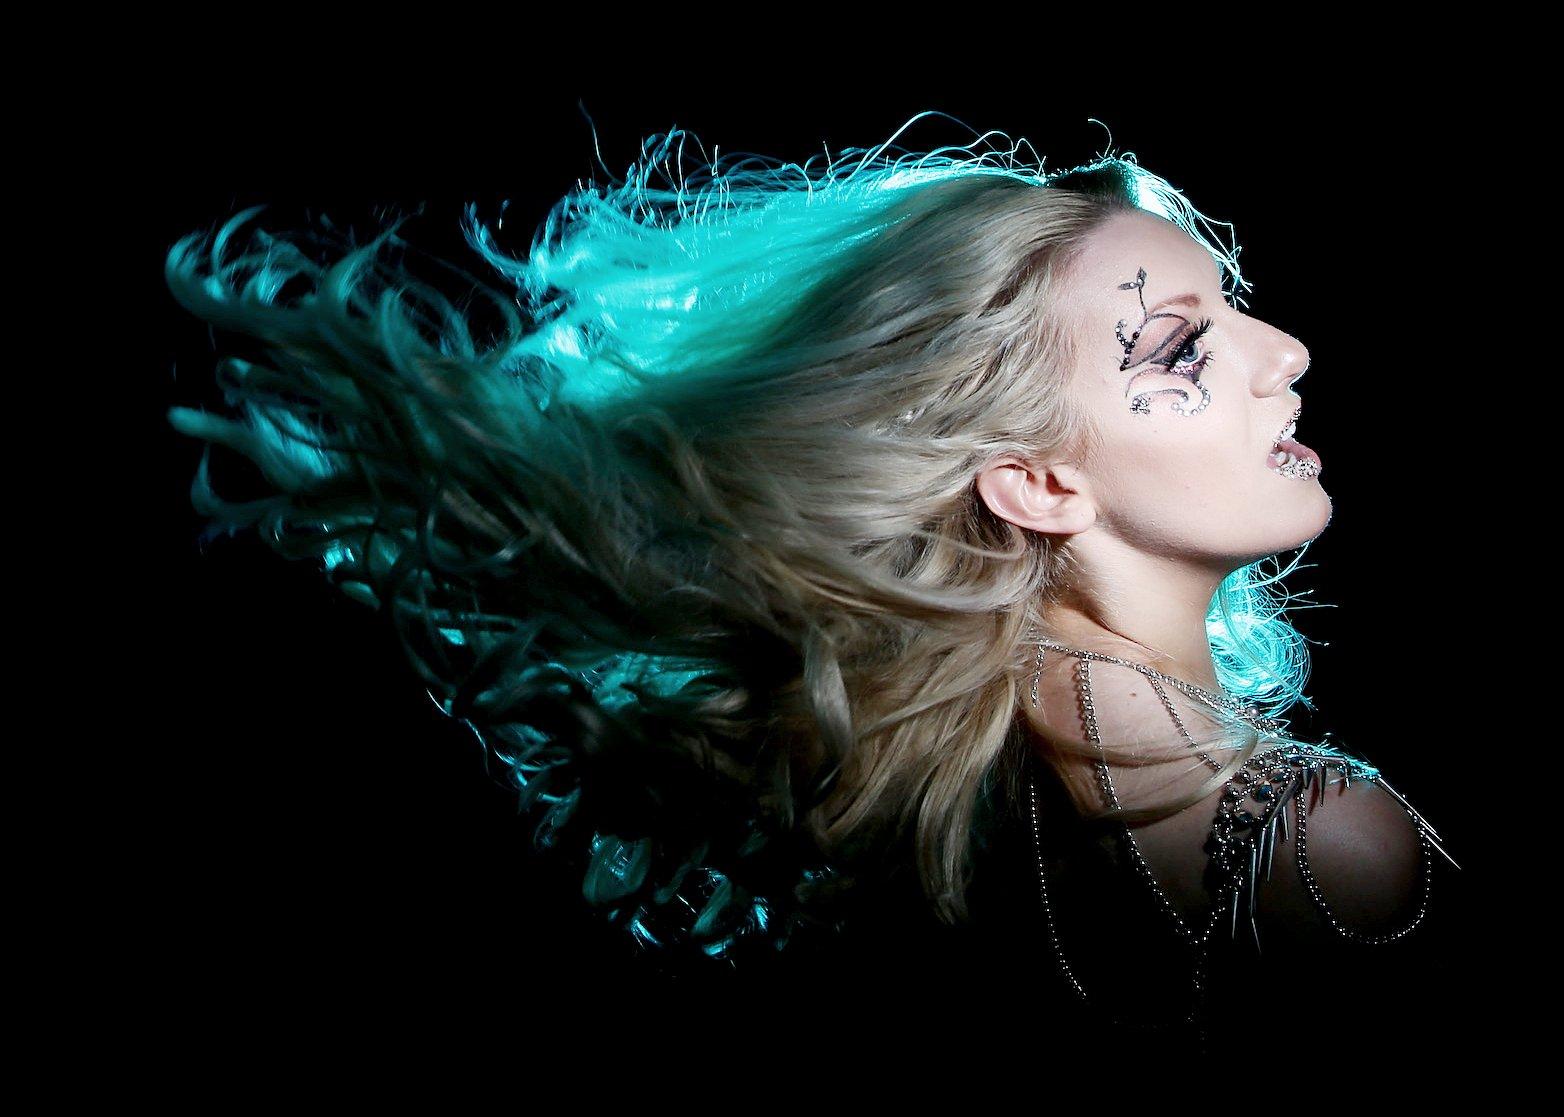 Performer Headshots, Portfolio Headshots, Singer Headshots, Singer, Natty Lou Palmer, Opera, Pop, Laura Pearman Photography, Laura Pearman, Headshots, Sch-Wham Headshots Service